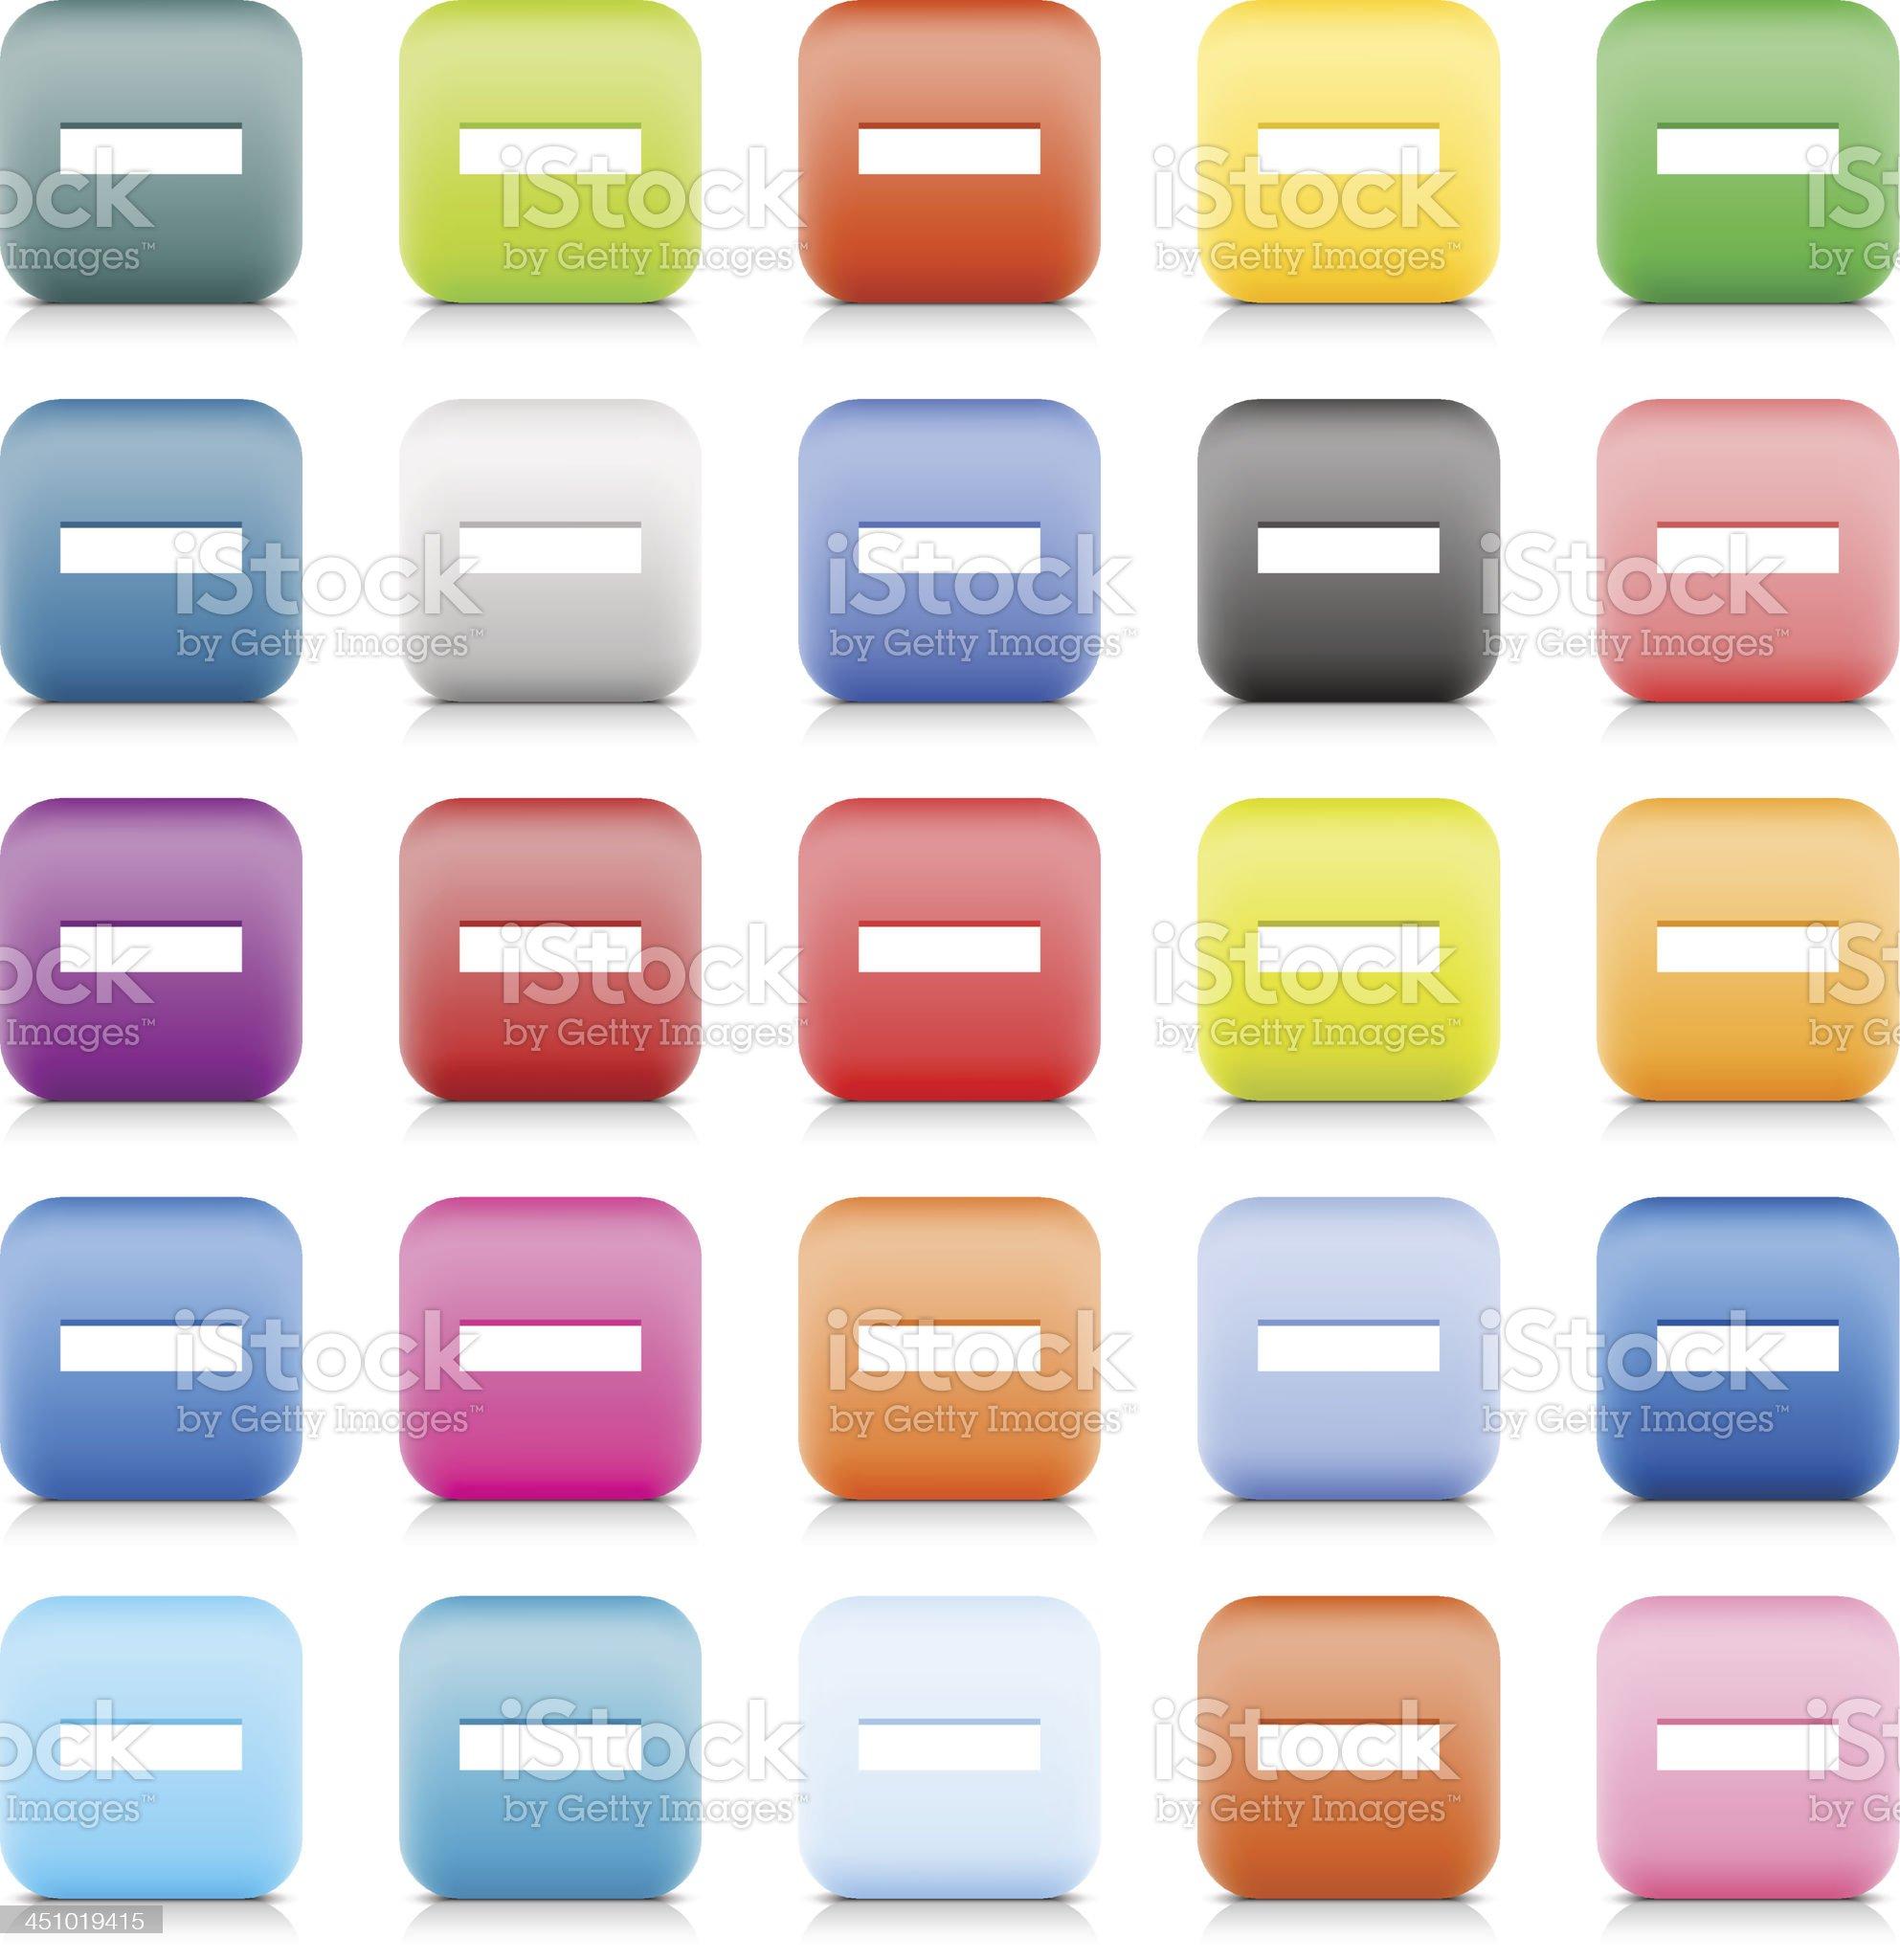 Minus web button color internet icon white pictogram royalty-free stock vector art